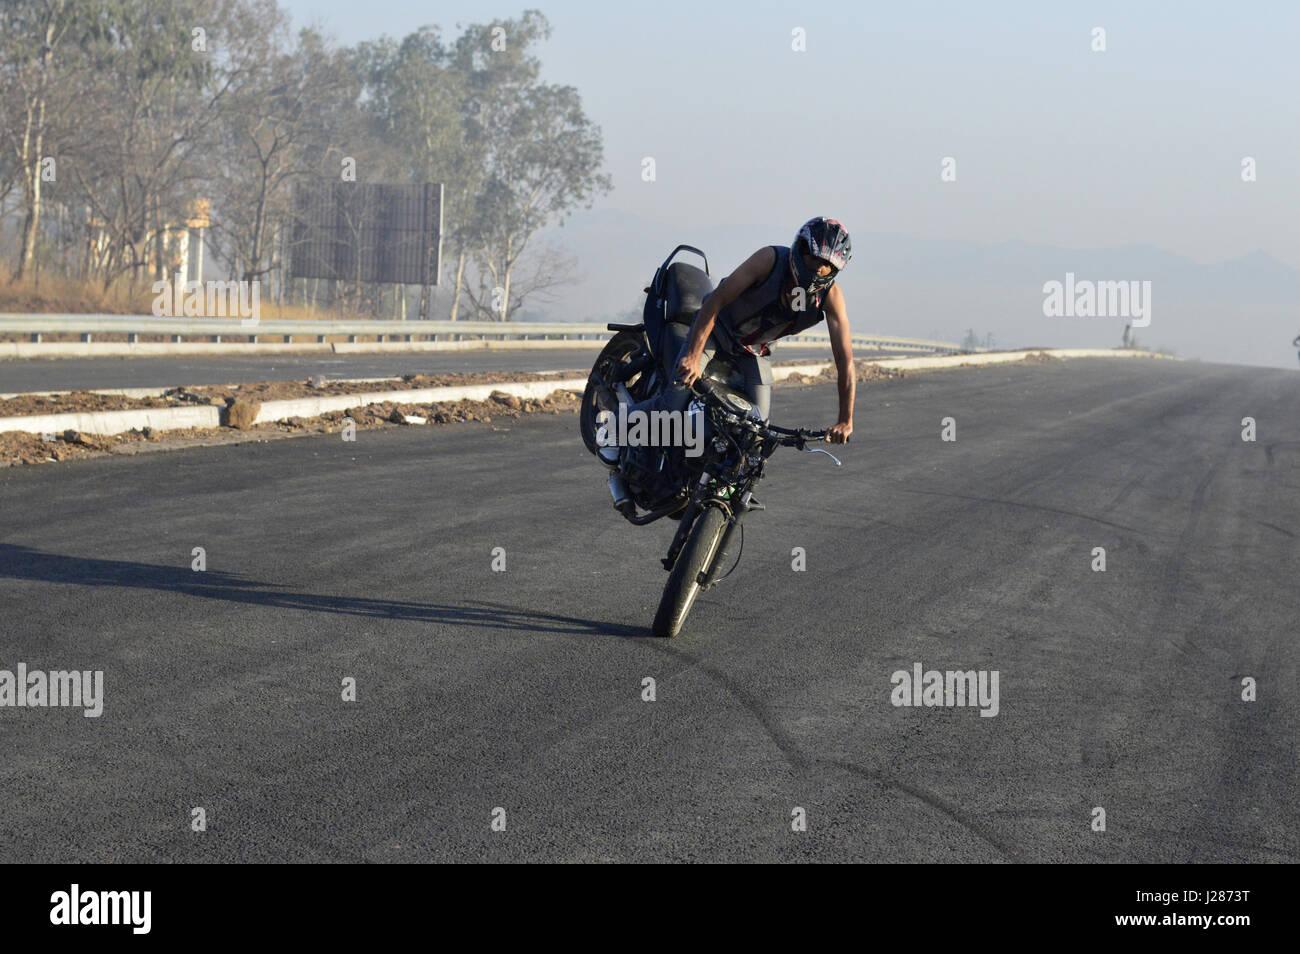 Stunt motorcycle rider making stoppie on a local road near Pune, Maharashtra - Stock Image